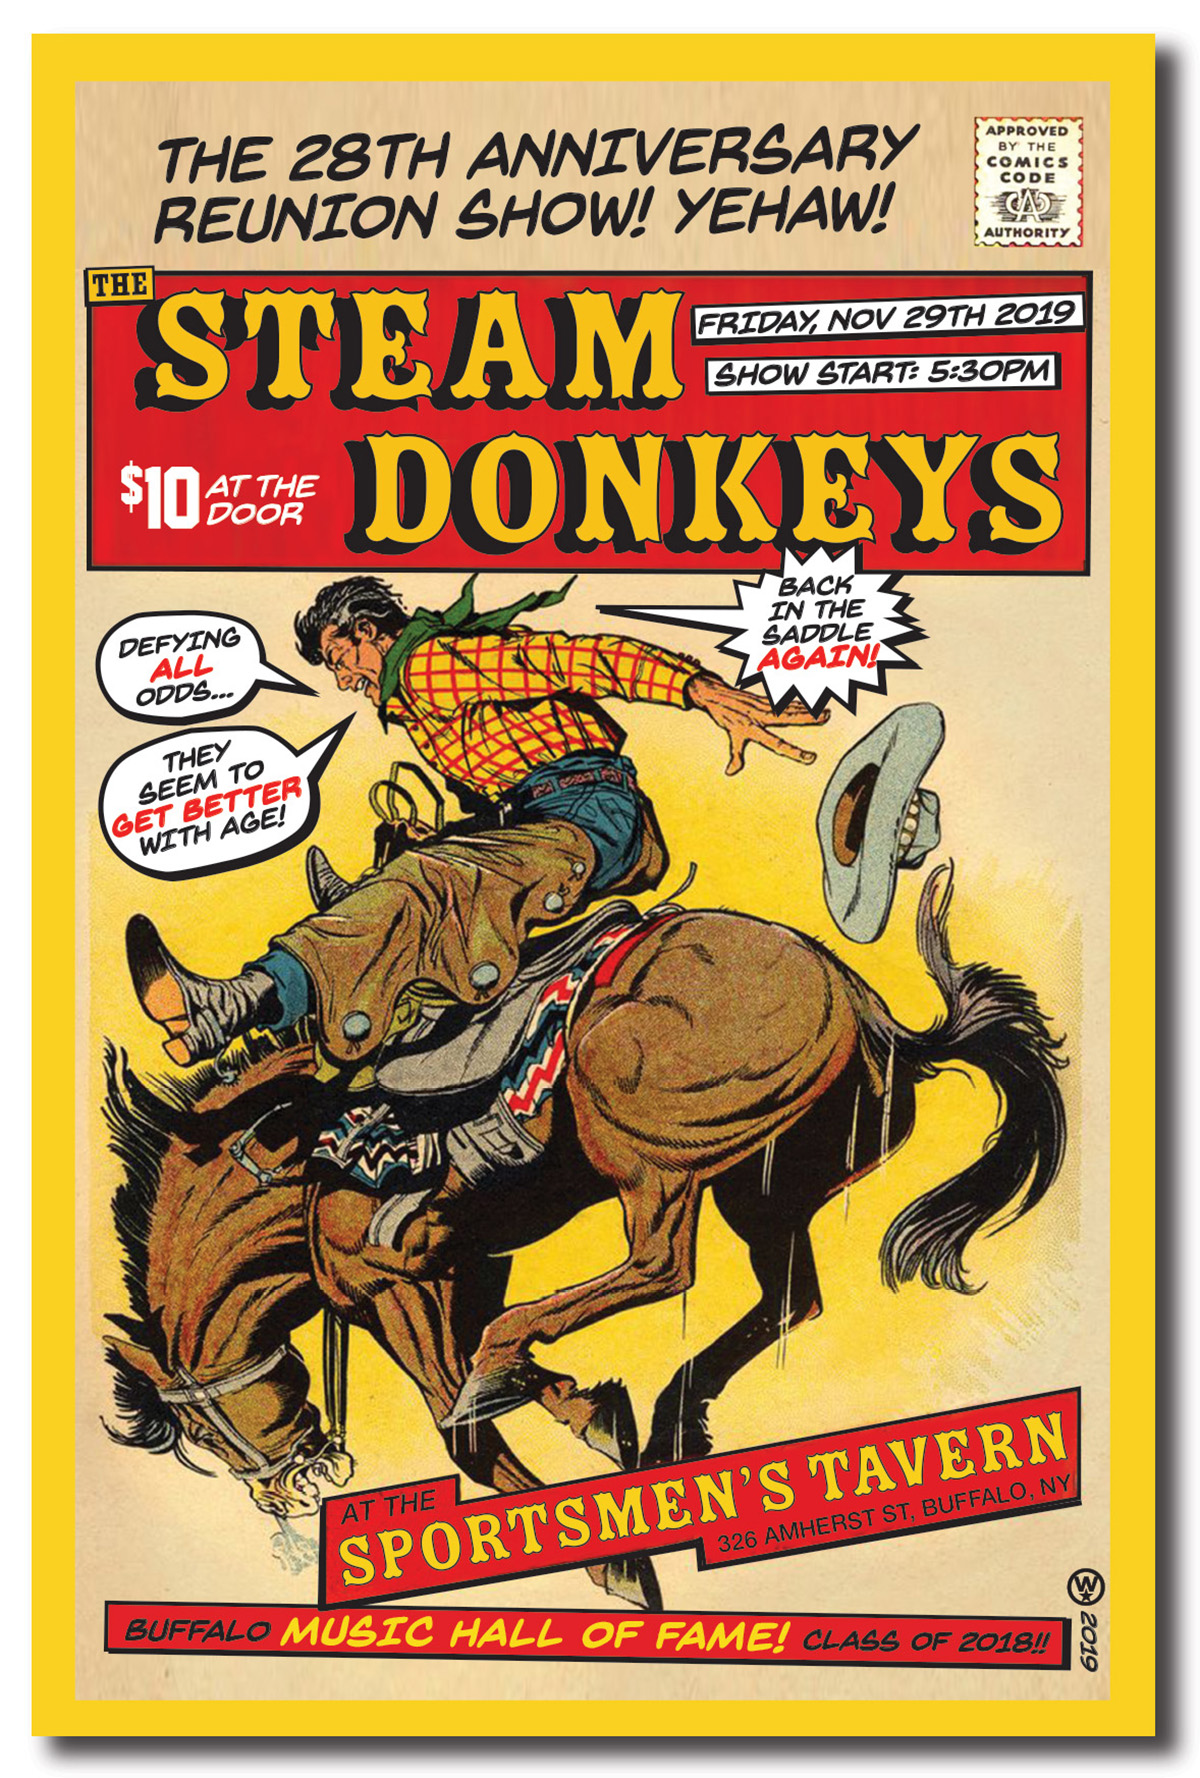 Steam Donkeys, anniversary reunion, rock poster, poster design, buffalo ny, mark wisz, vintage western comic, homage